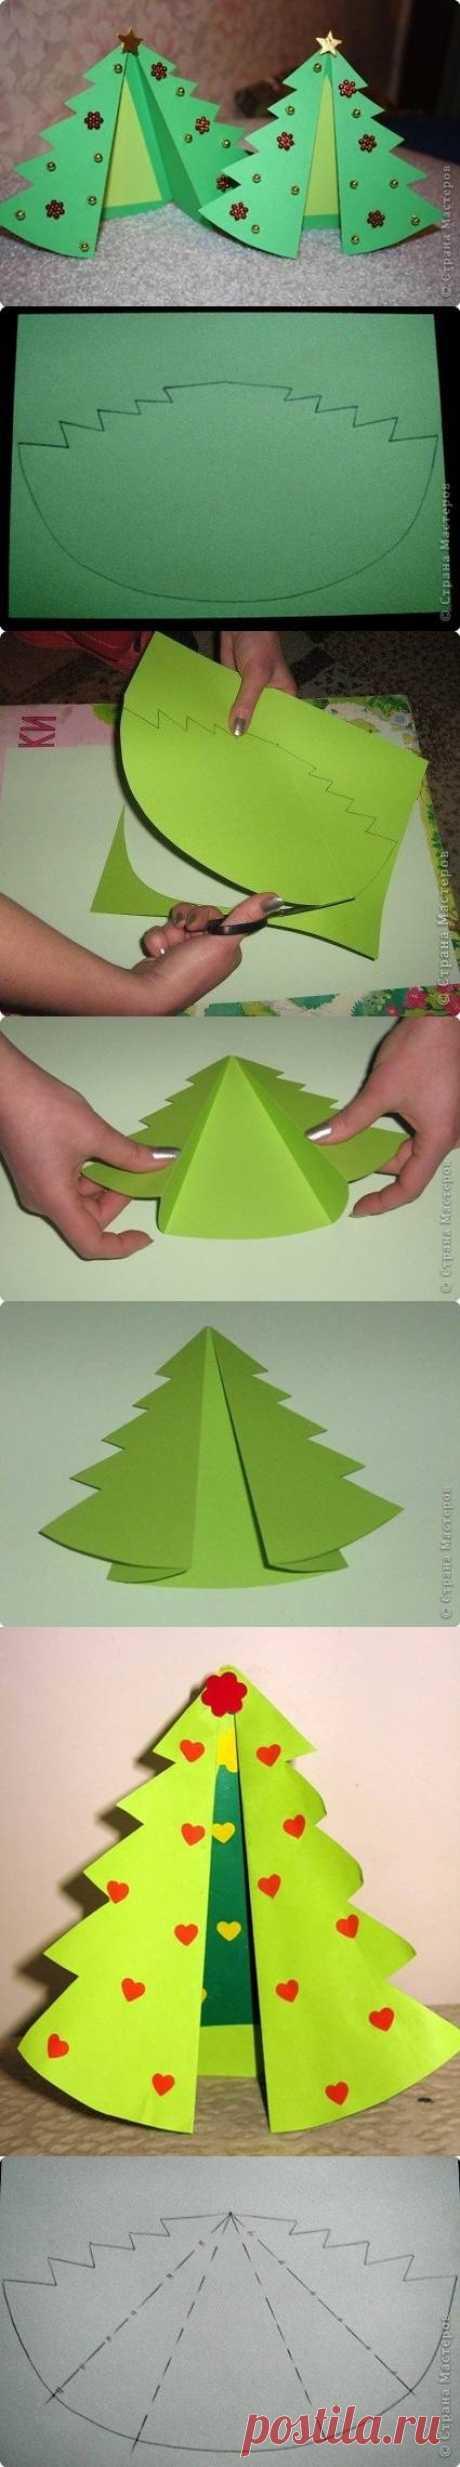 DIY Tree Style Card DIY Tree Style Card